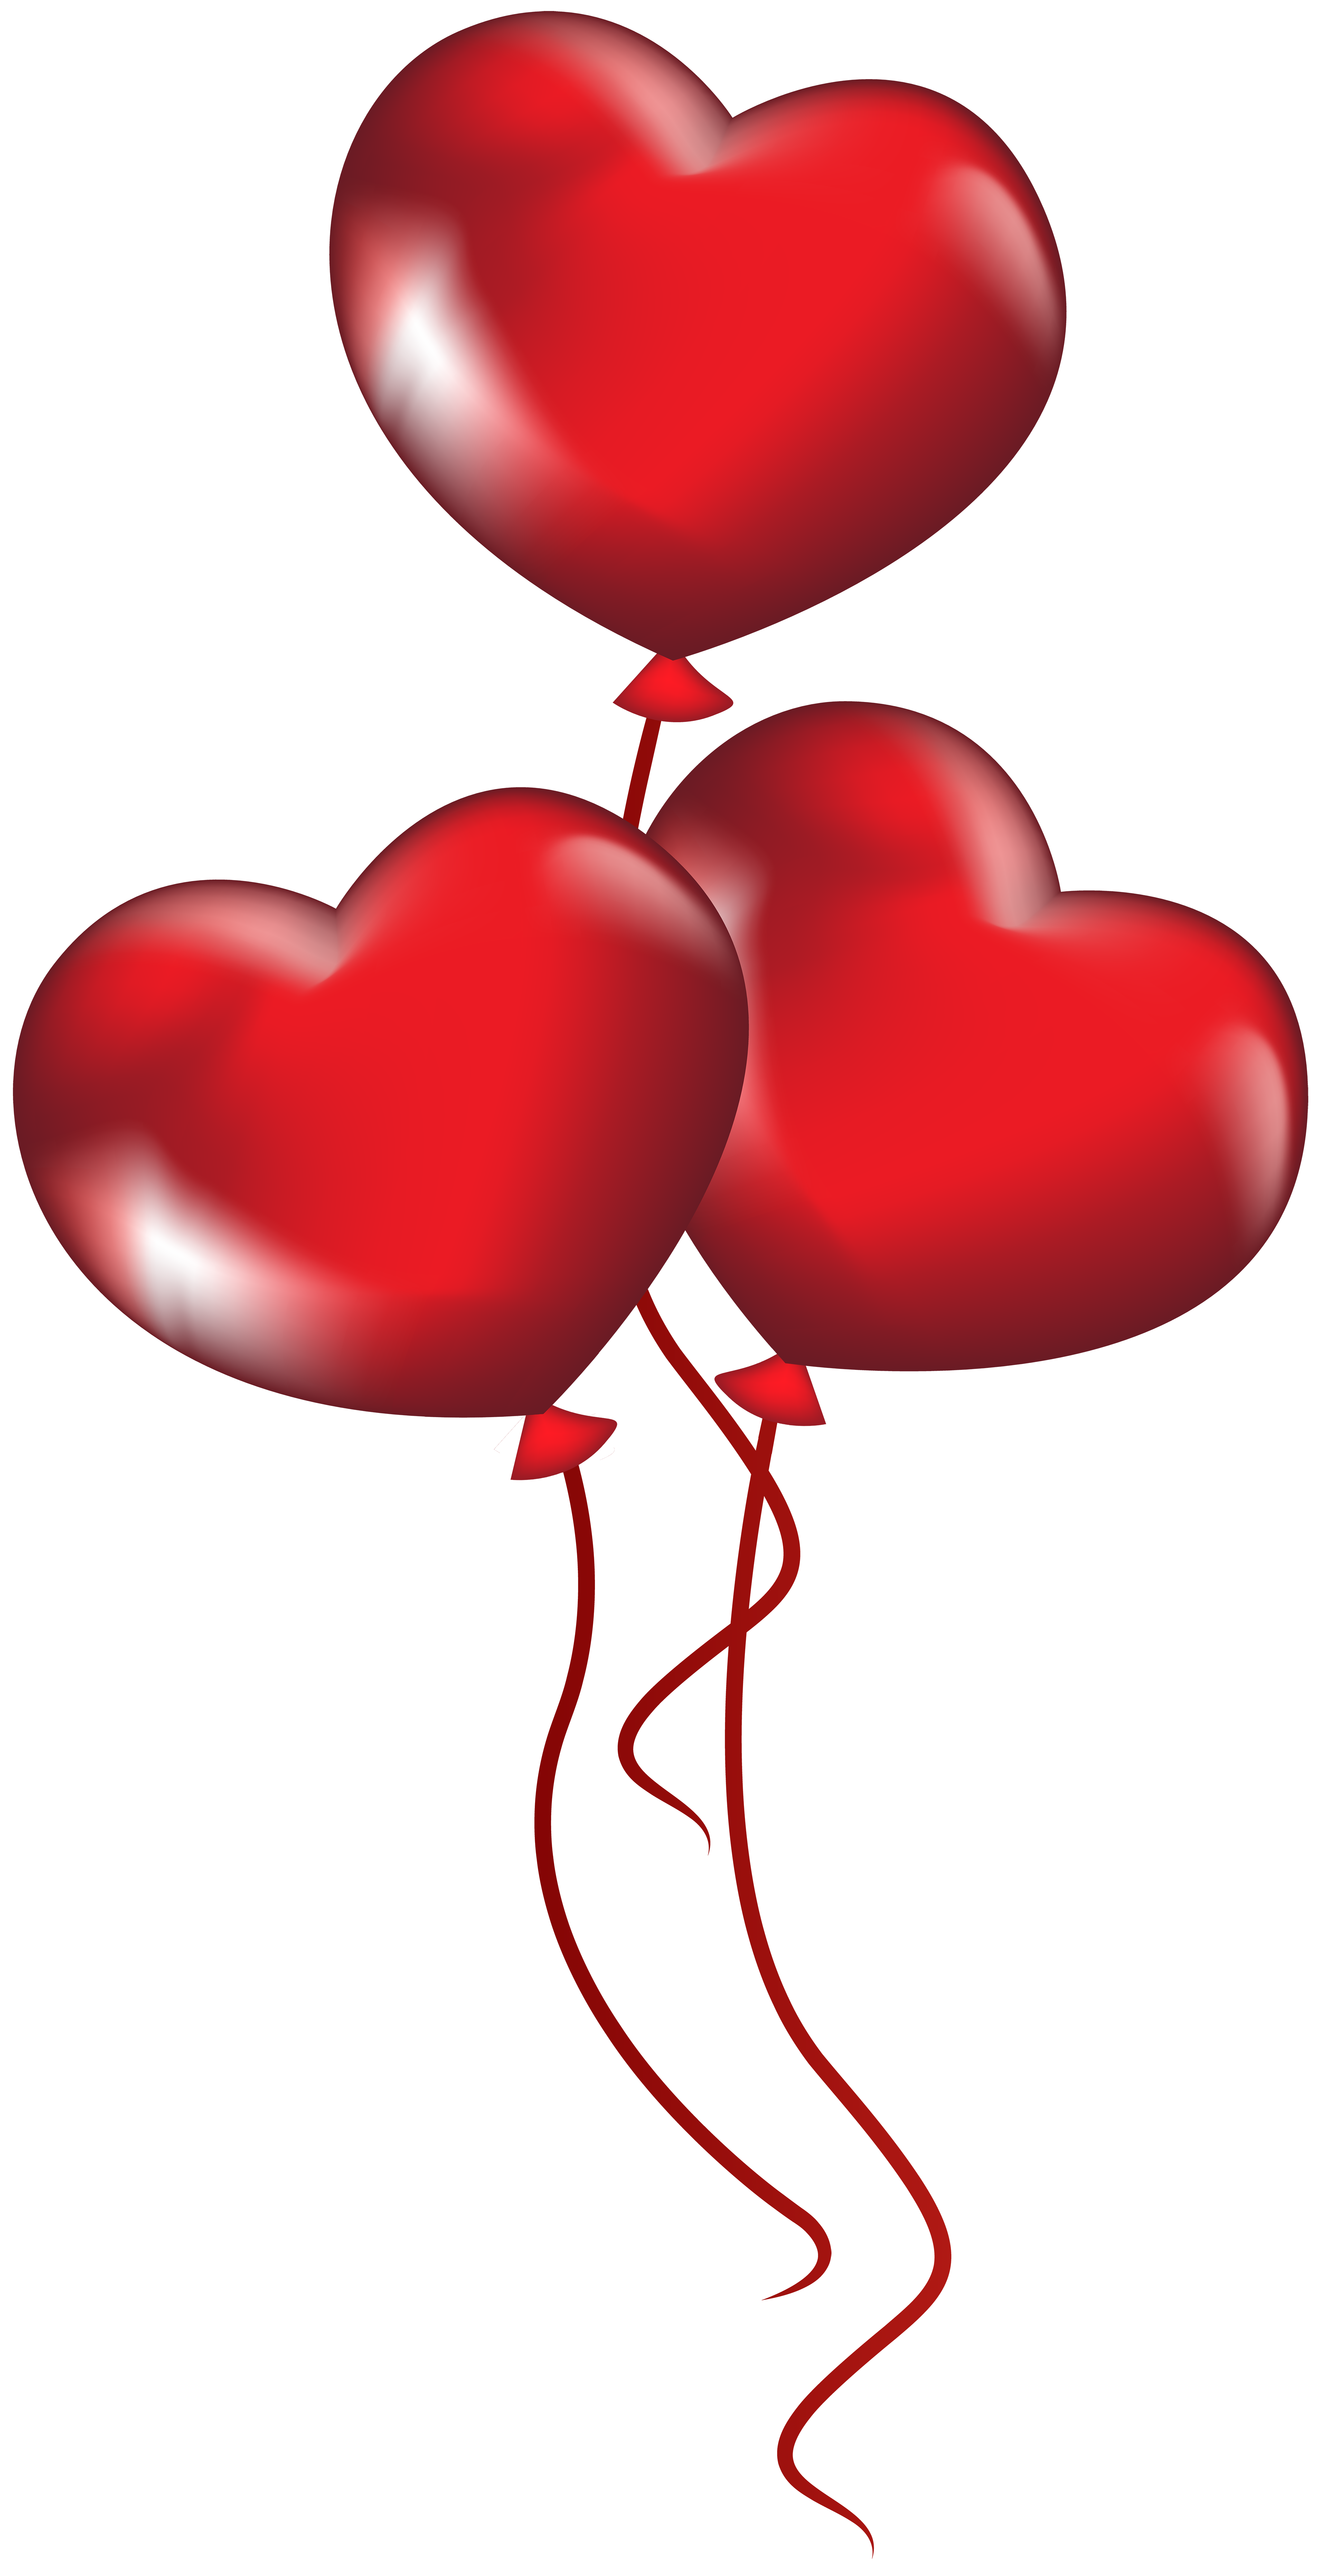 Heart balloons clipart clip art library download Heart Balloons Transparent PNG Clip Art | Gallery Yopriceville ... clip art library download